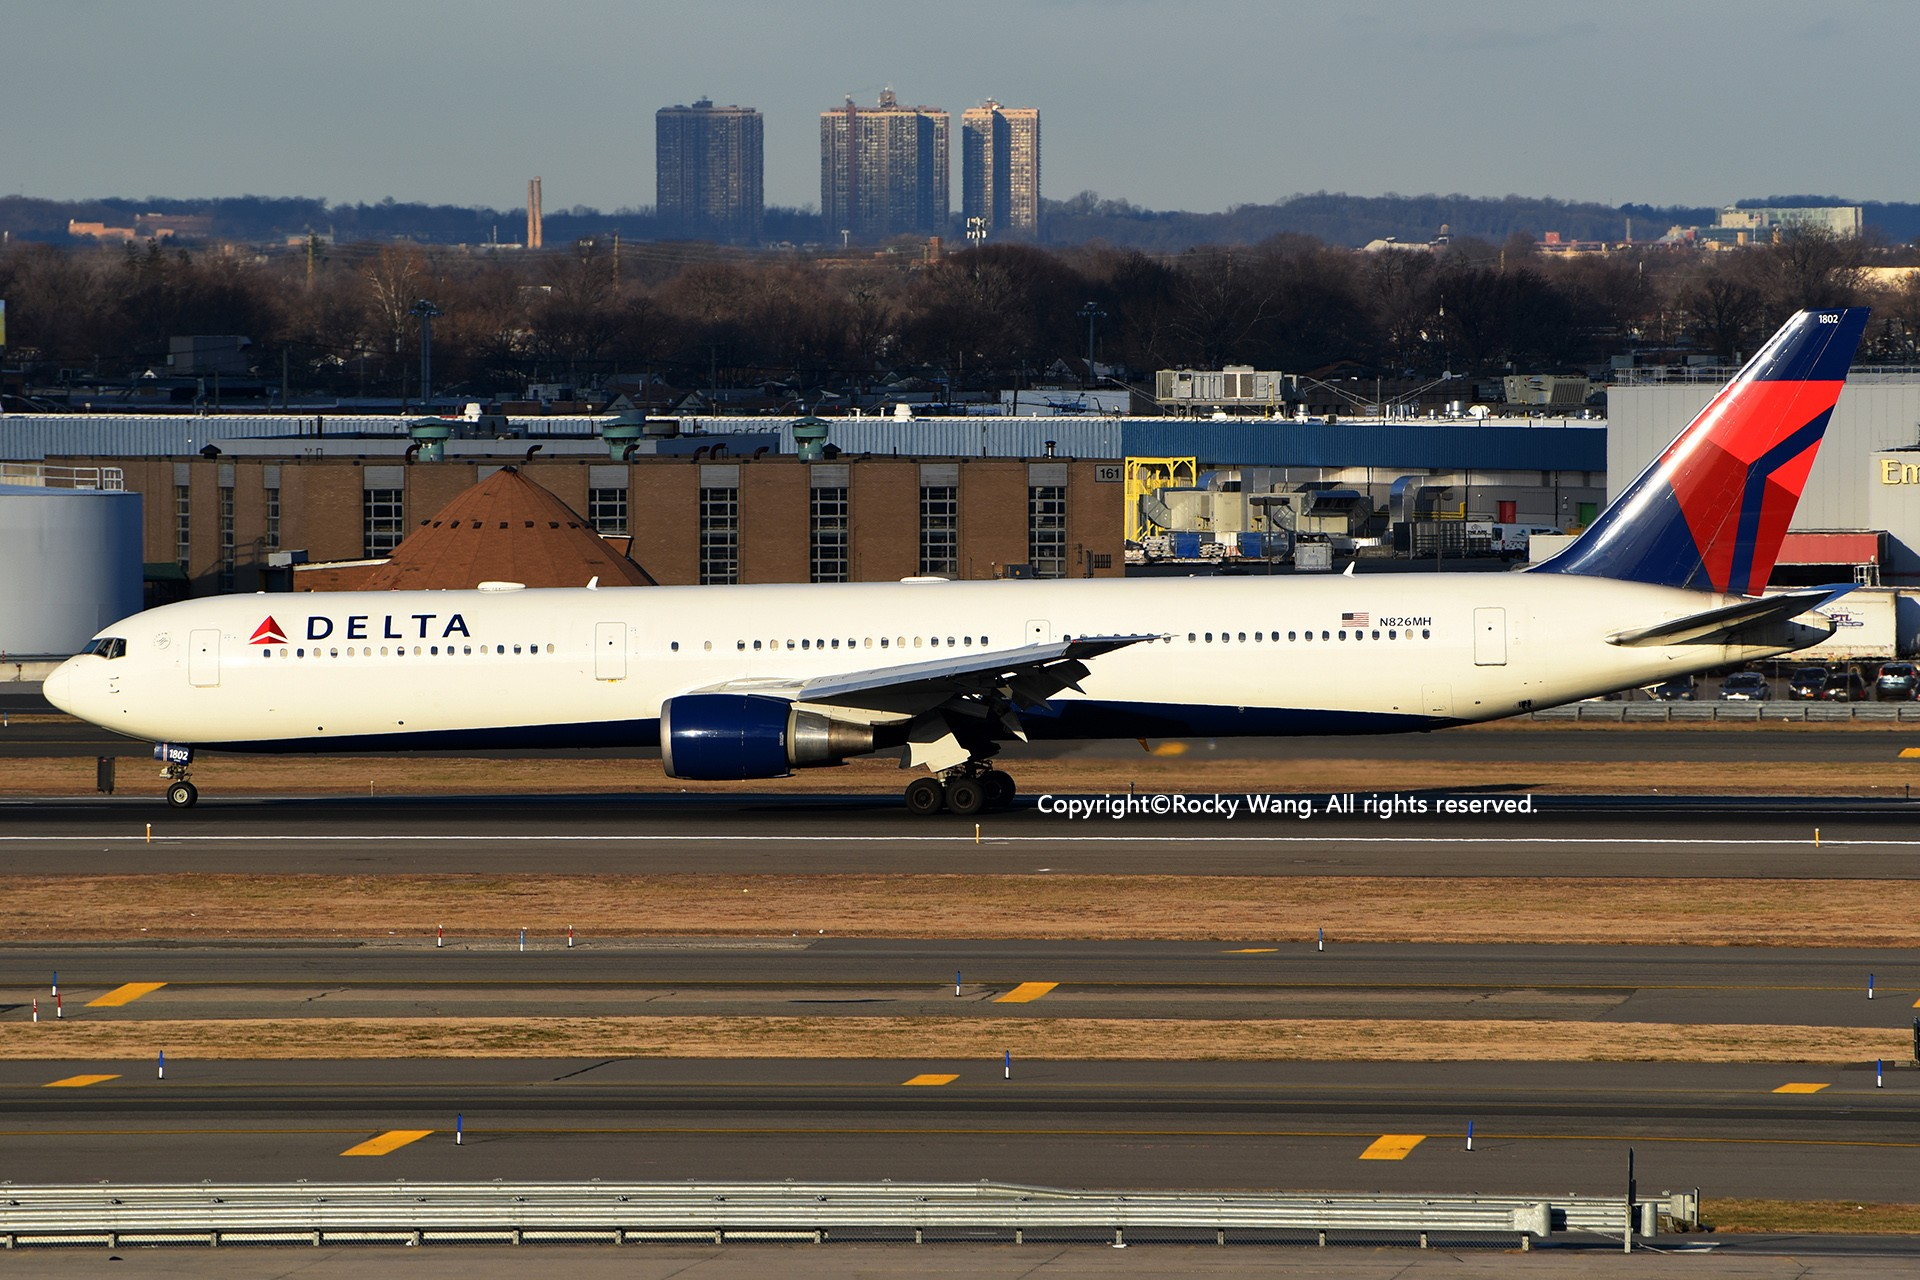 Re:[原创]KJFK 30图 BOEING 767-432(ER) N826MH New York John F. Kennedy Int'l Airport